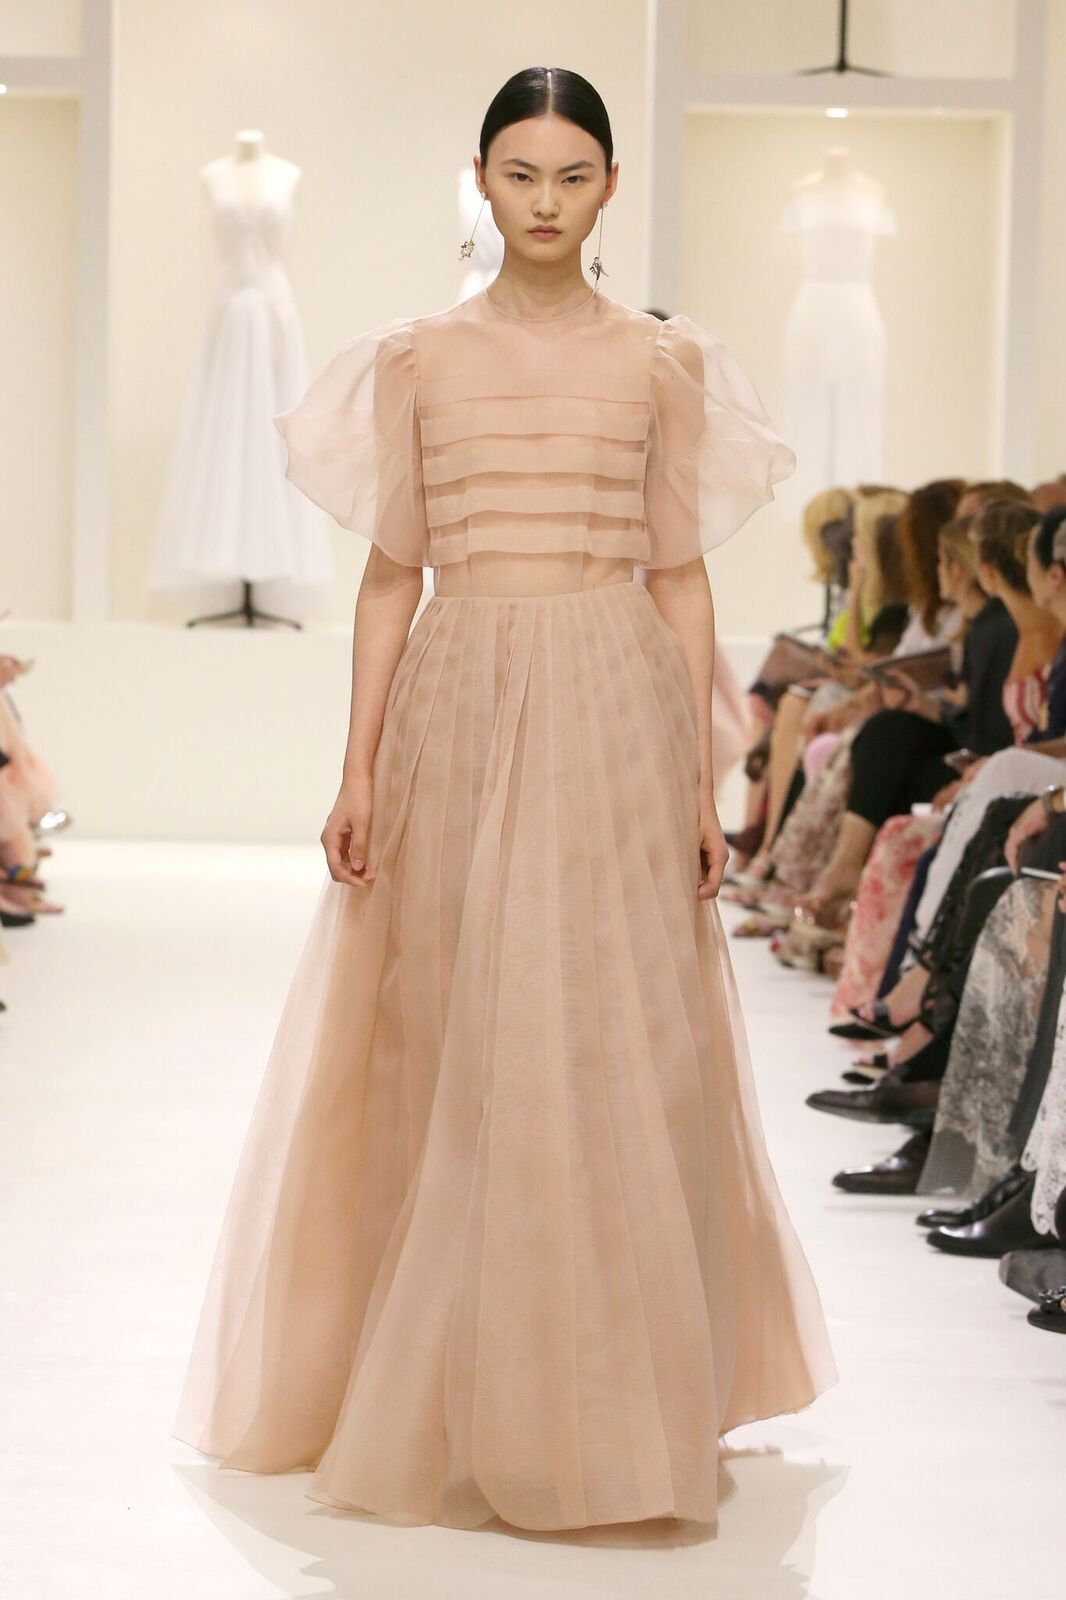 77 Chambre Syndicale De La Haute Couture Check More At Https